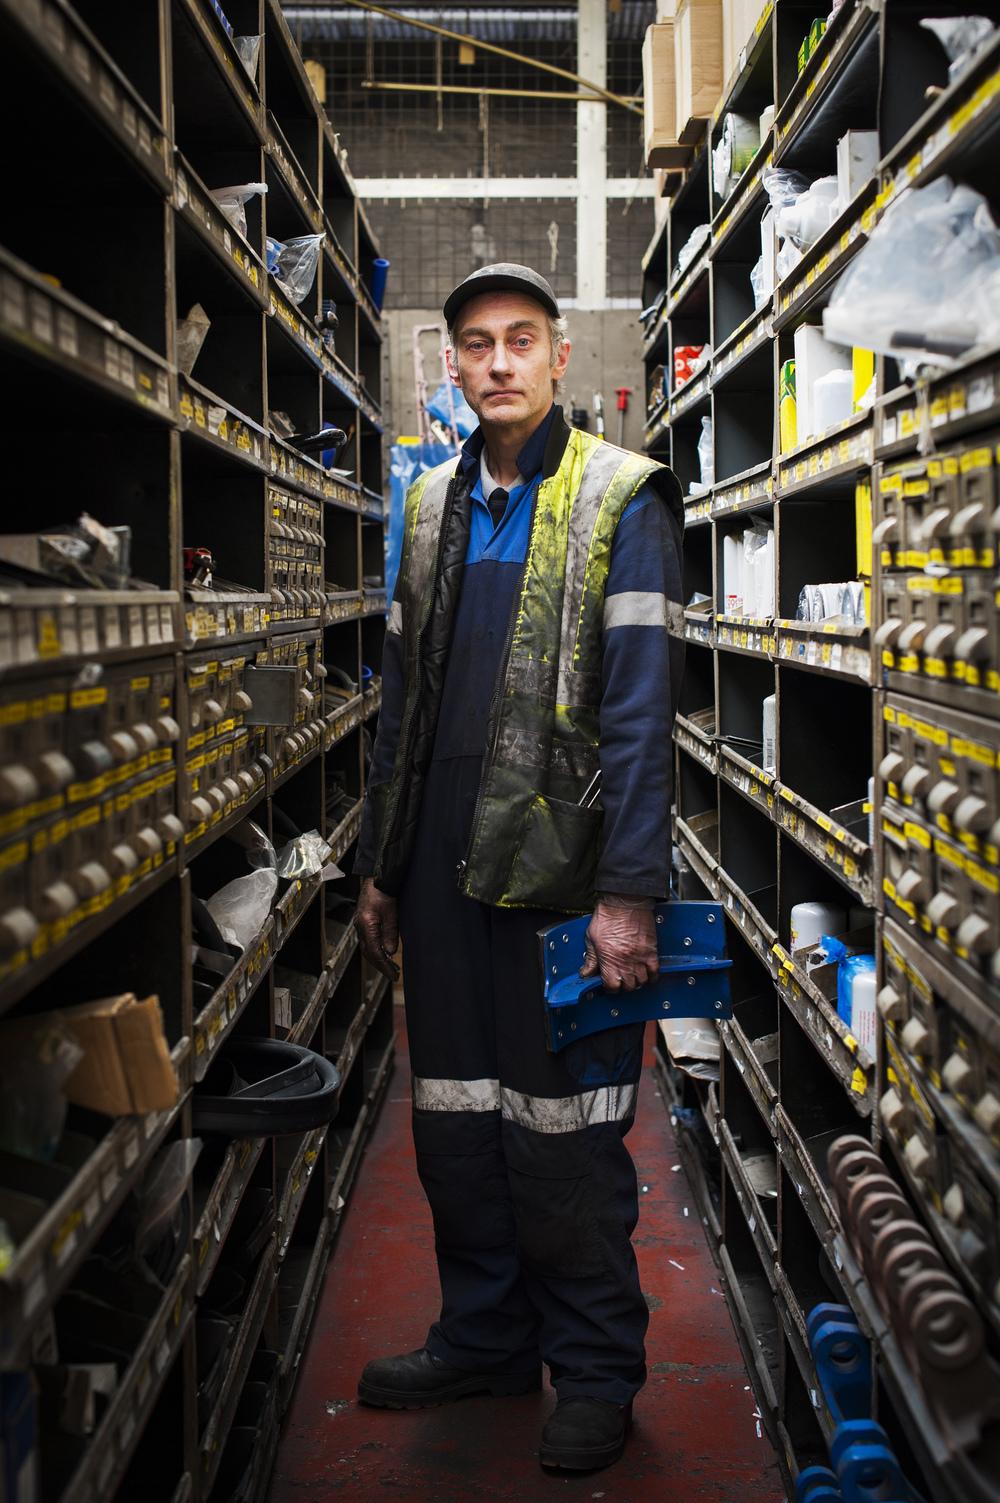 Portraitof a Mechanicat work.